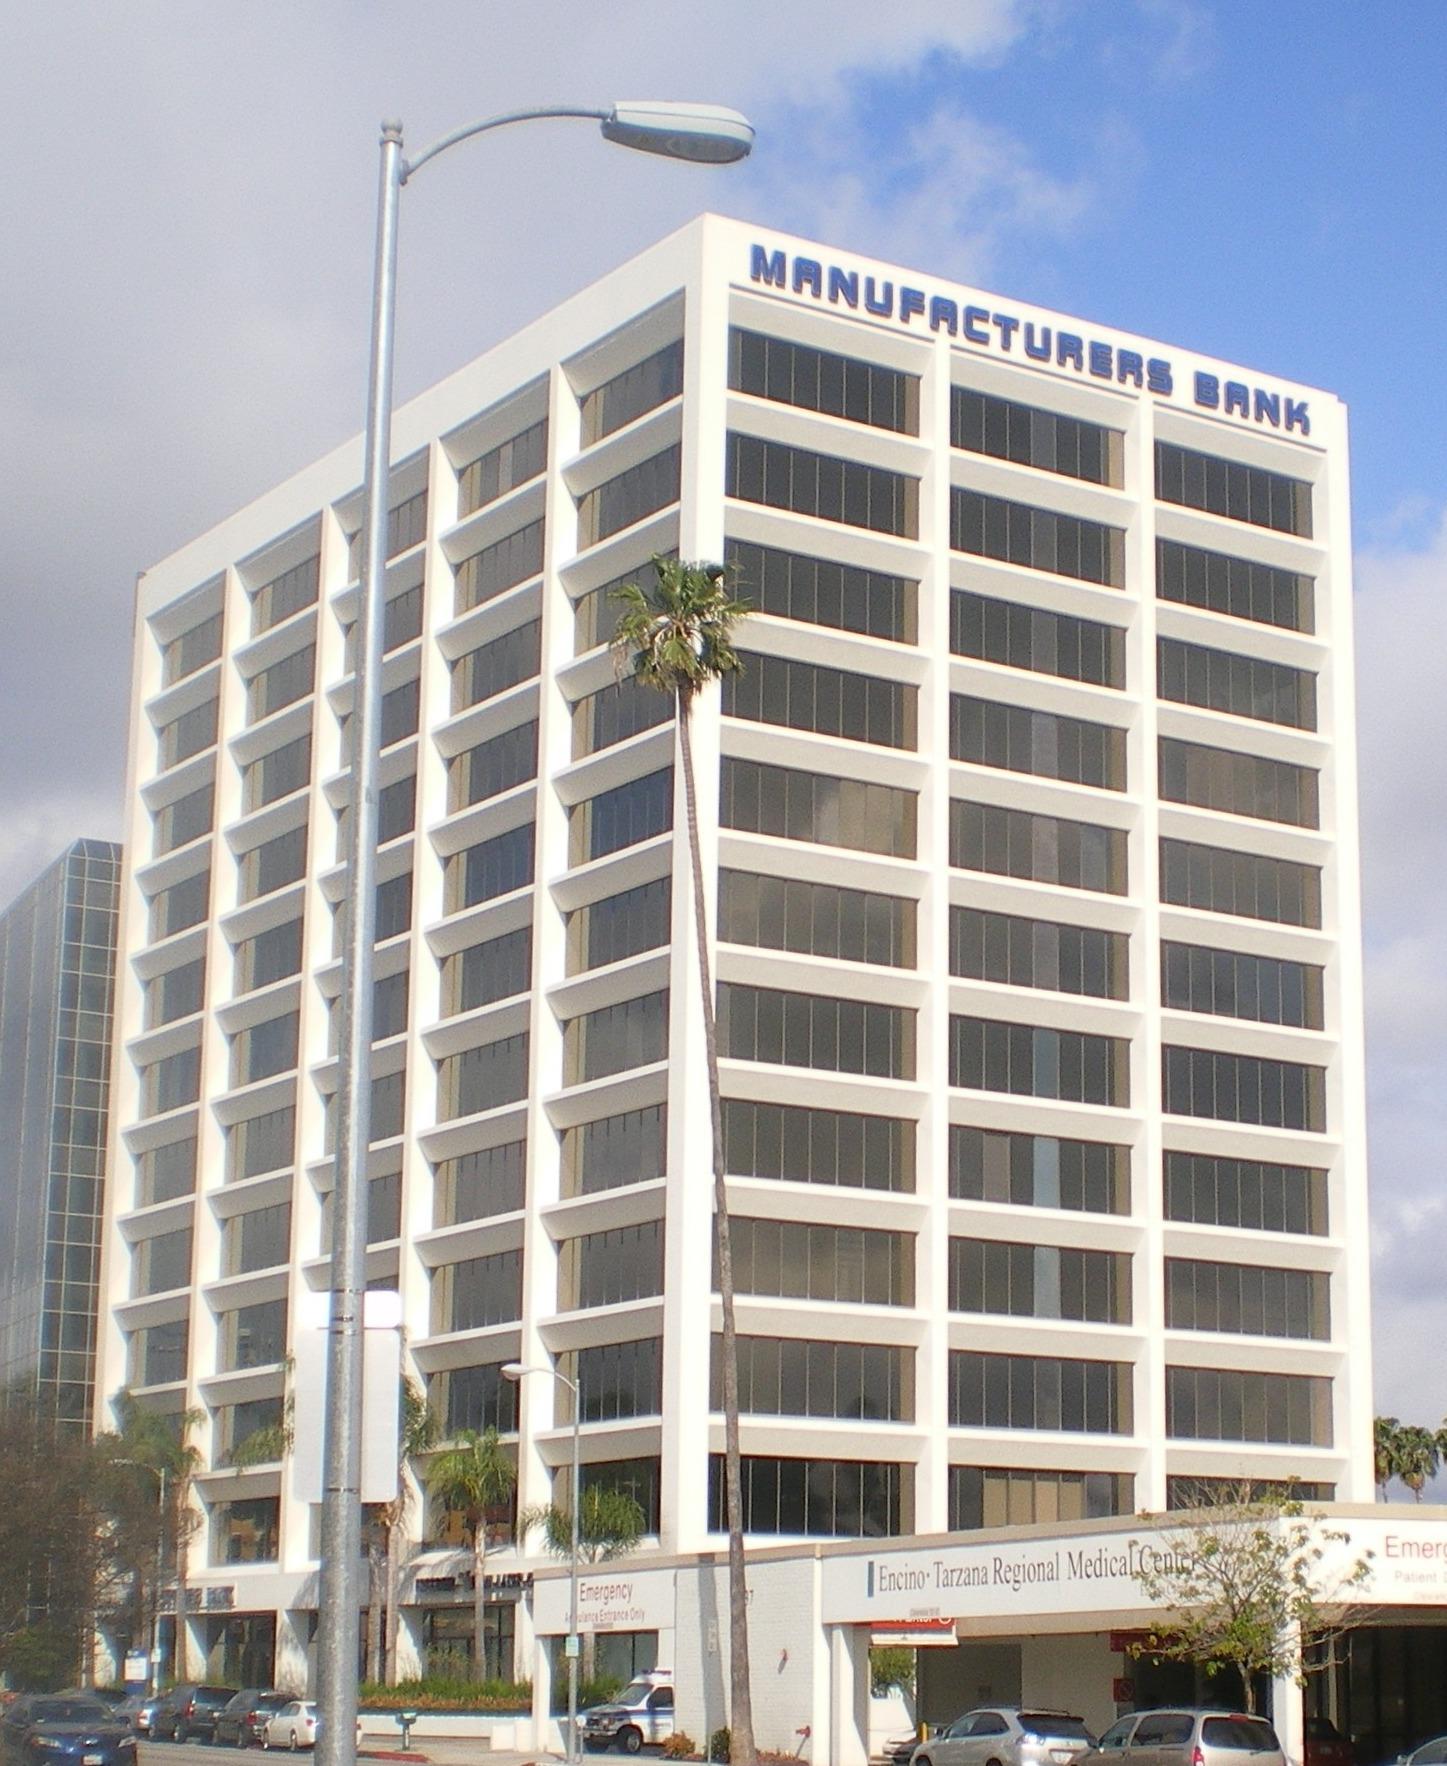 File Manufacturers Bank Building Encino Jpg